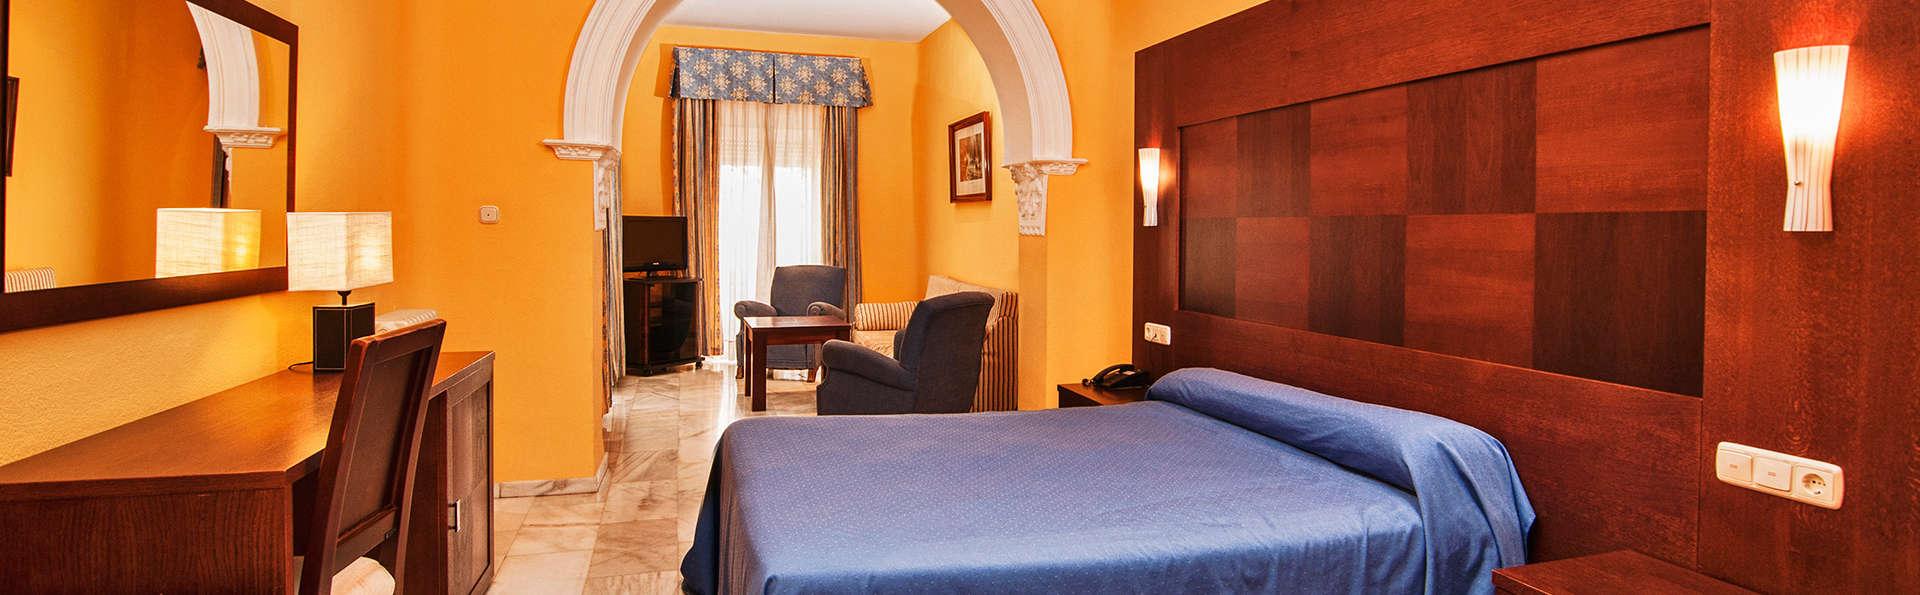 Hotel Nuevo Palas - EDIT_room6.jpg